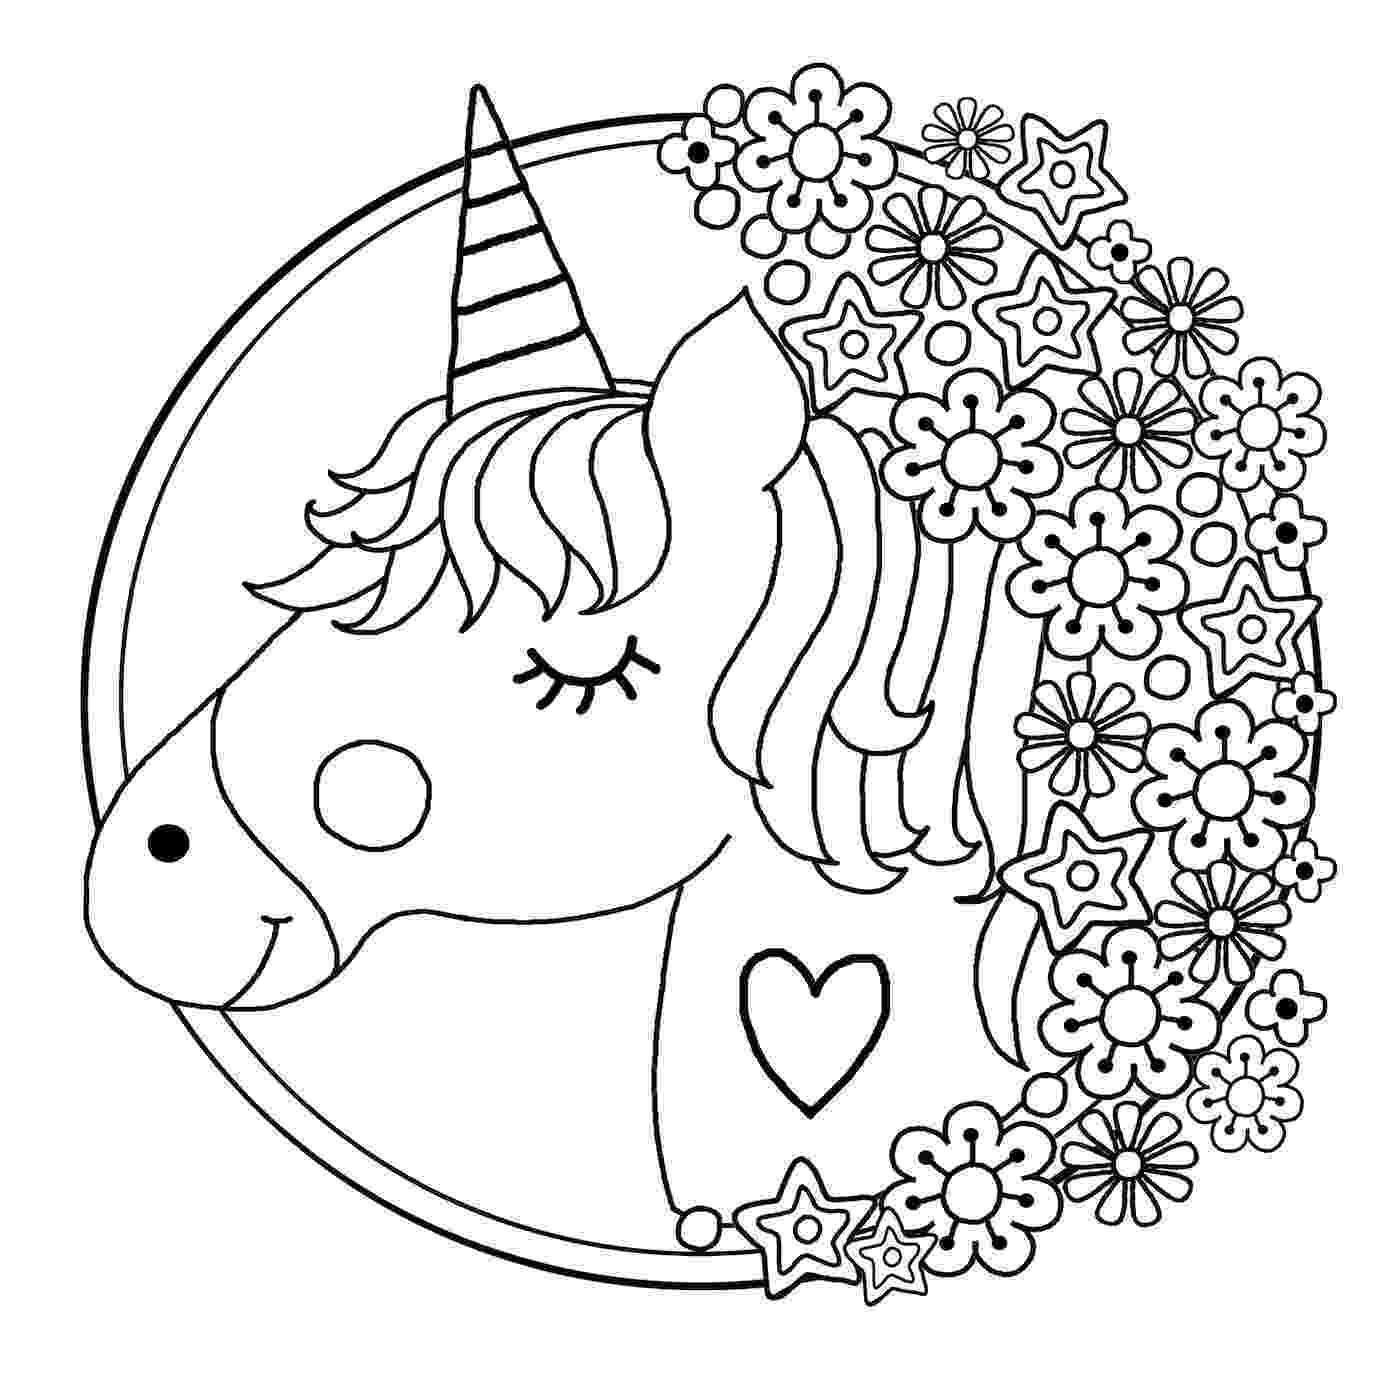 unicorn printable coloring pages unicorn printable coloring pages coloring page unicorn unicorn printable pages coloring